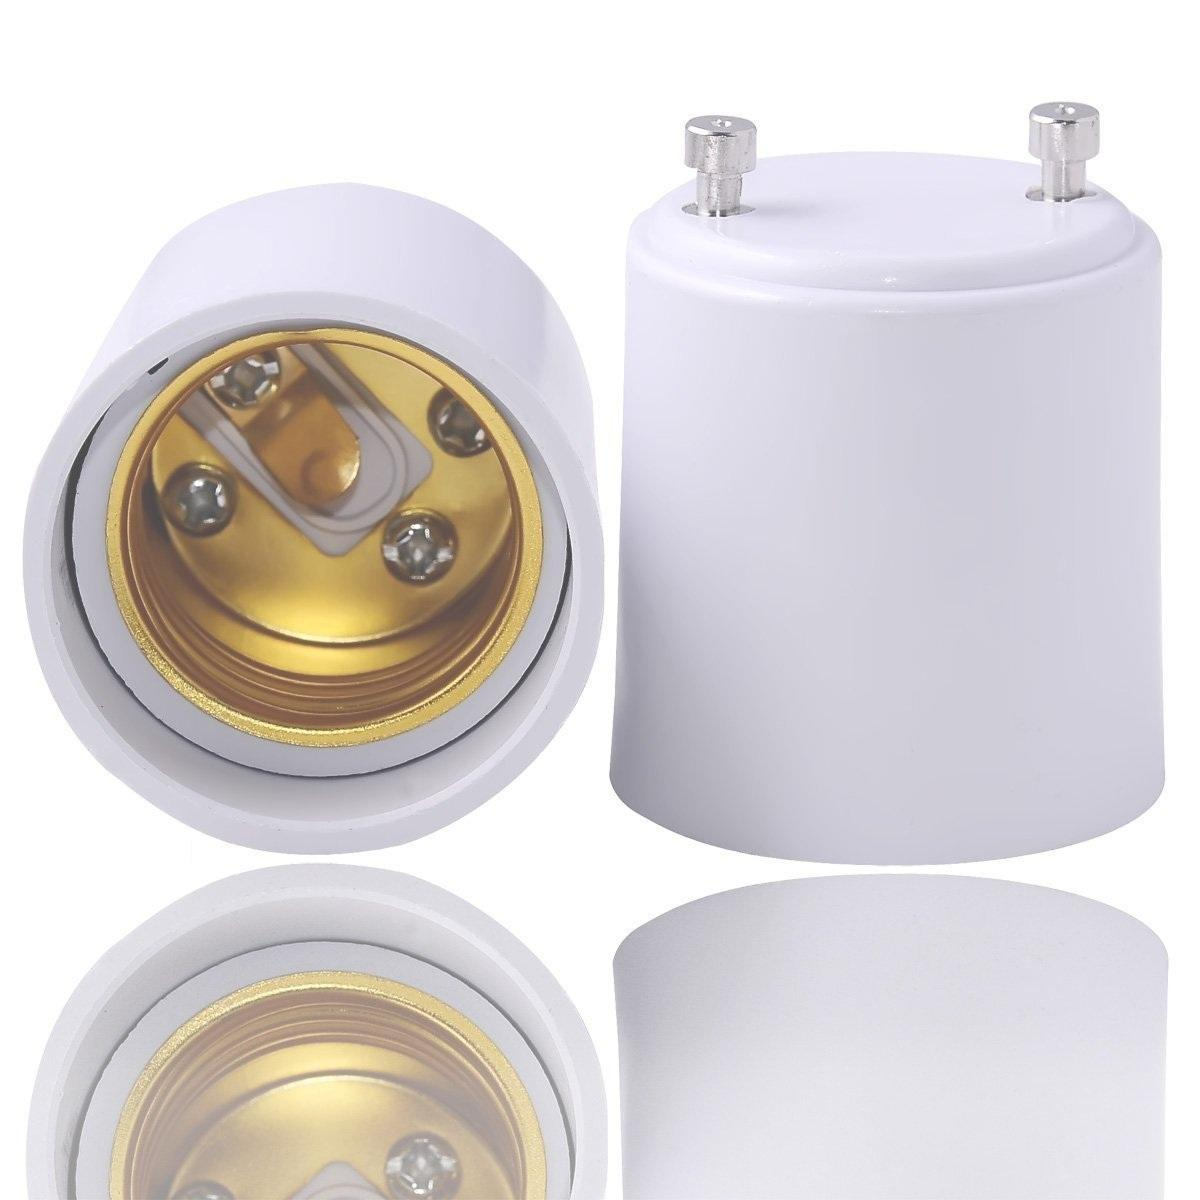 Jackyled Gu24 To E26 E27 Adapter Pack Of 10 Maximum